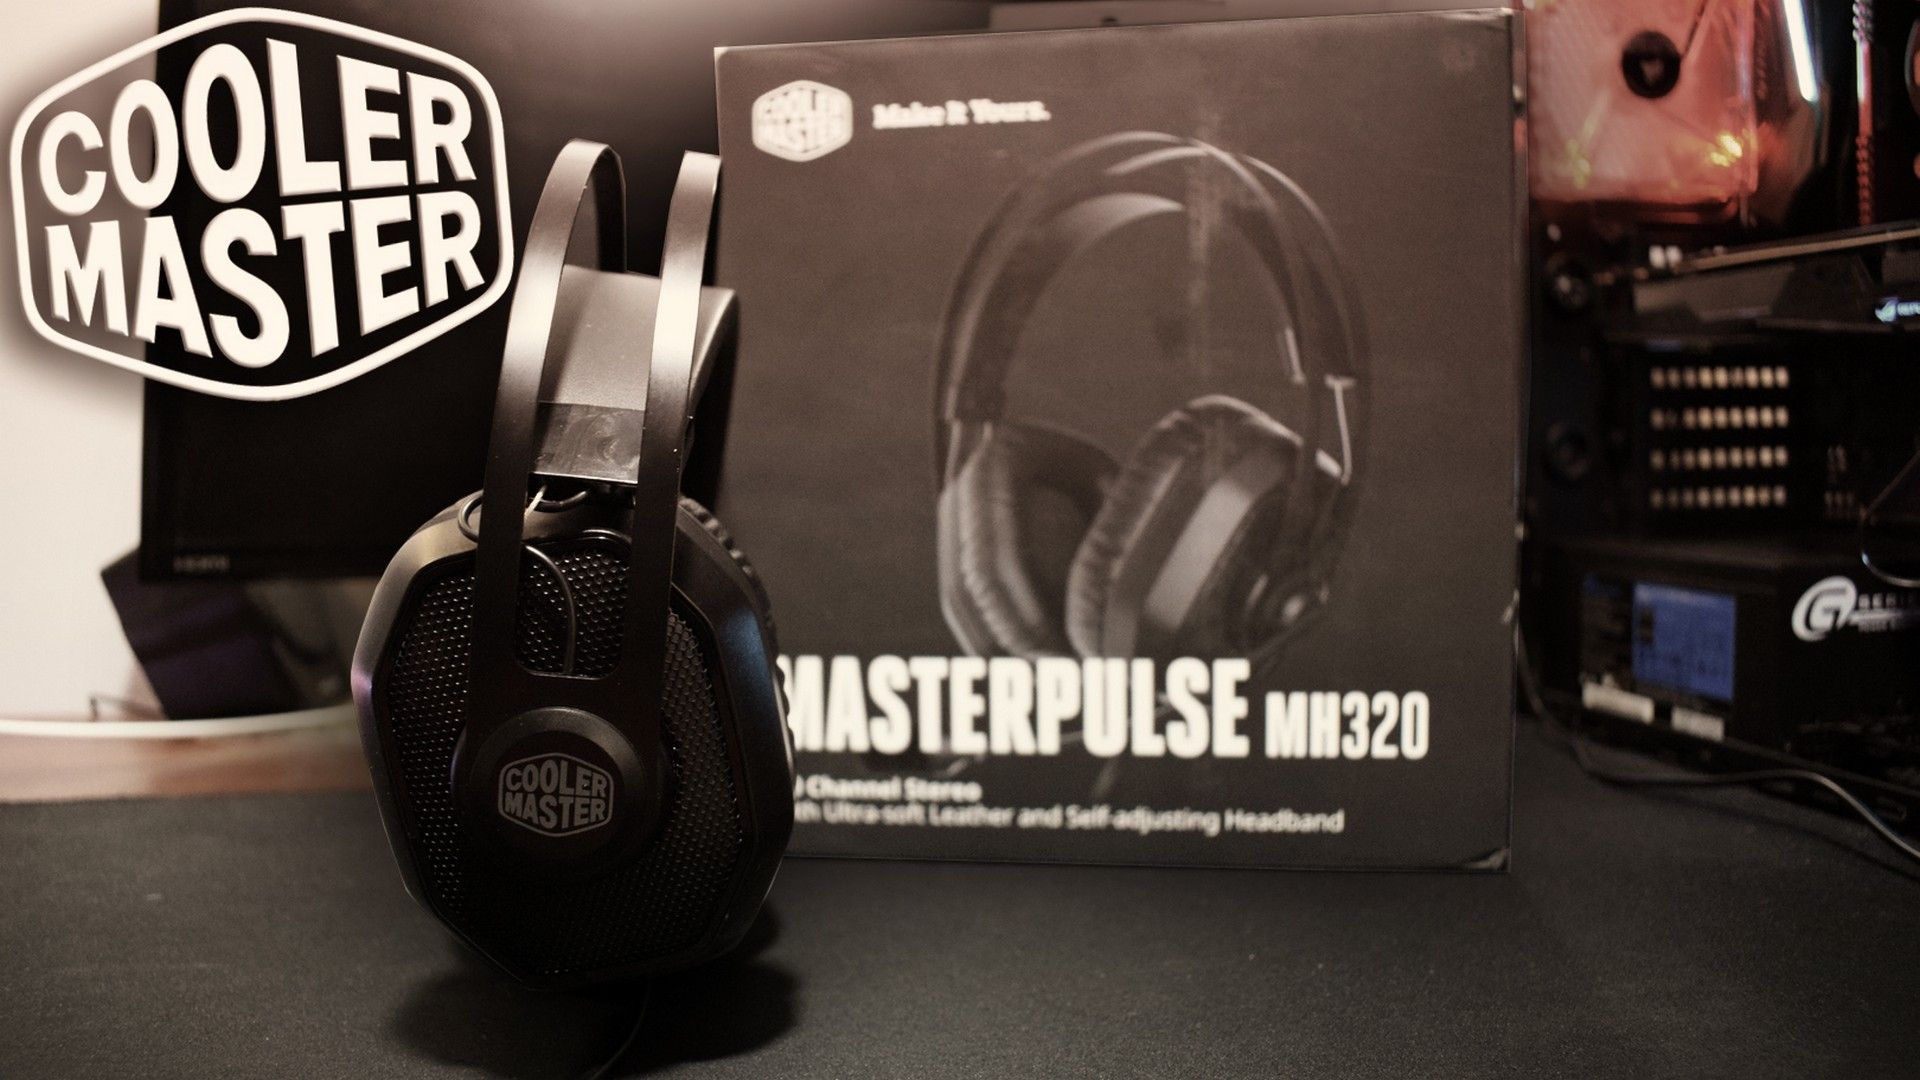 CM MasterPulse MH320 Thumbnail3.jpg